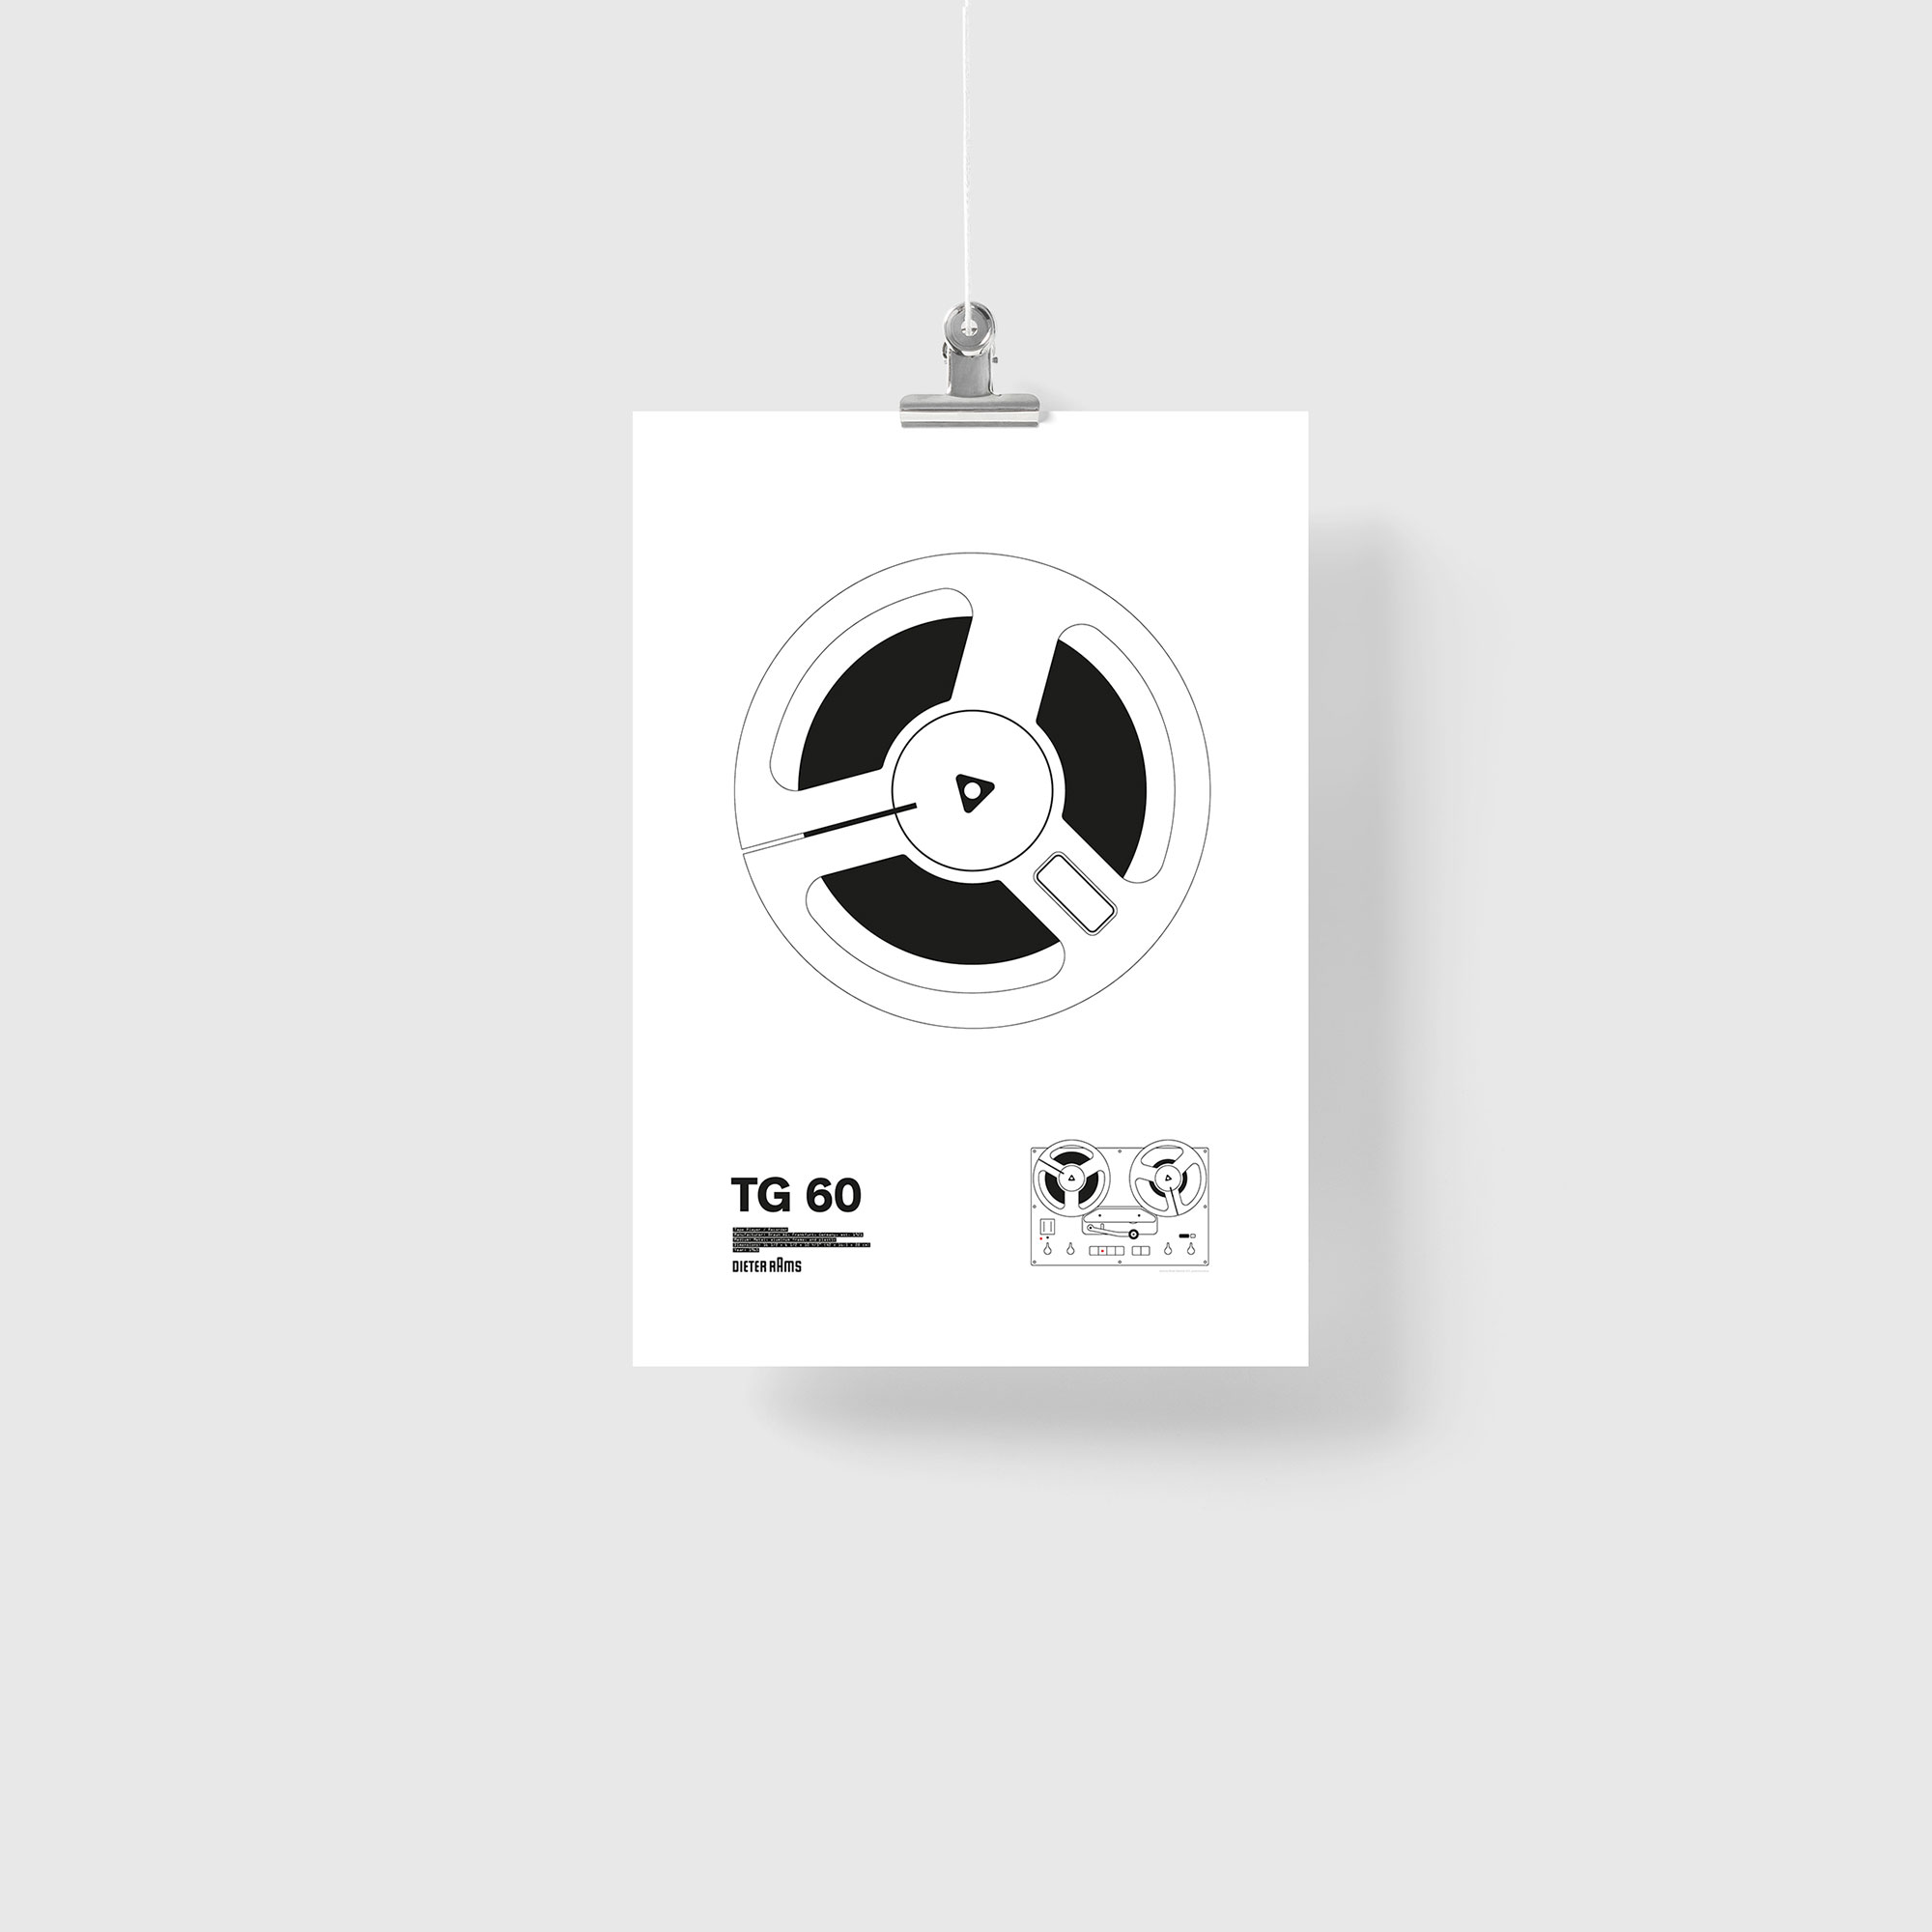 Braun TG 60 Illustration Poster Giclée Print